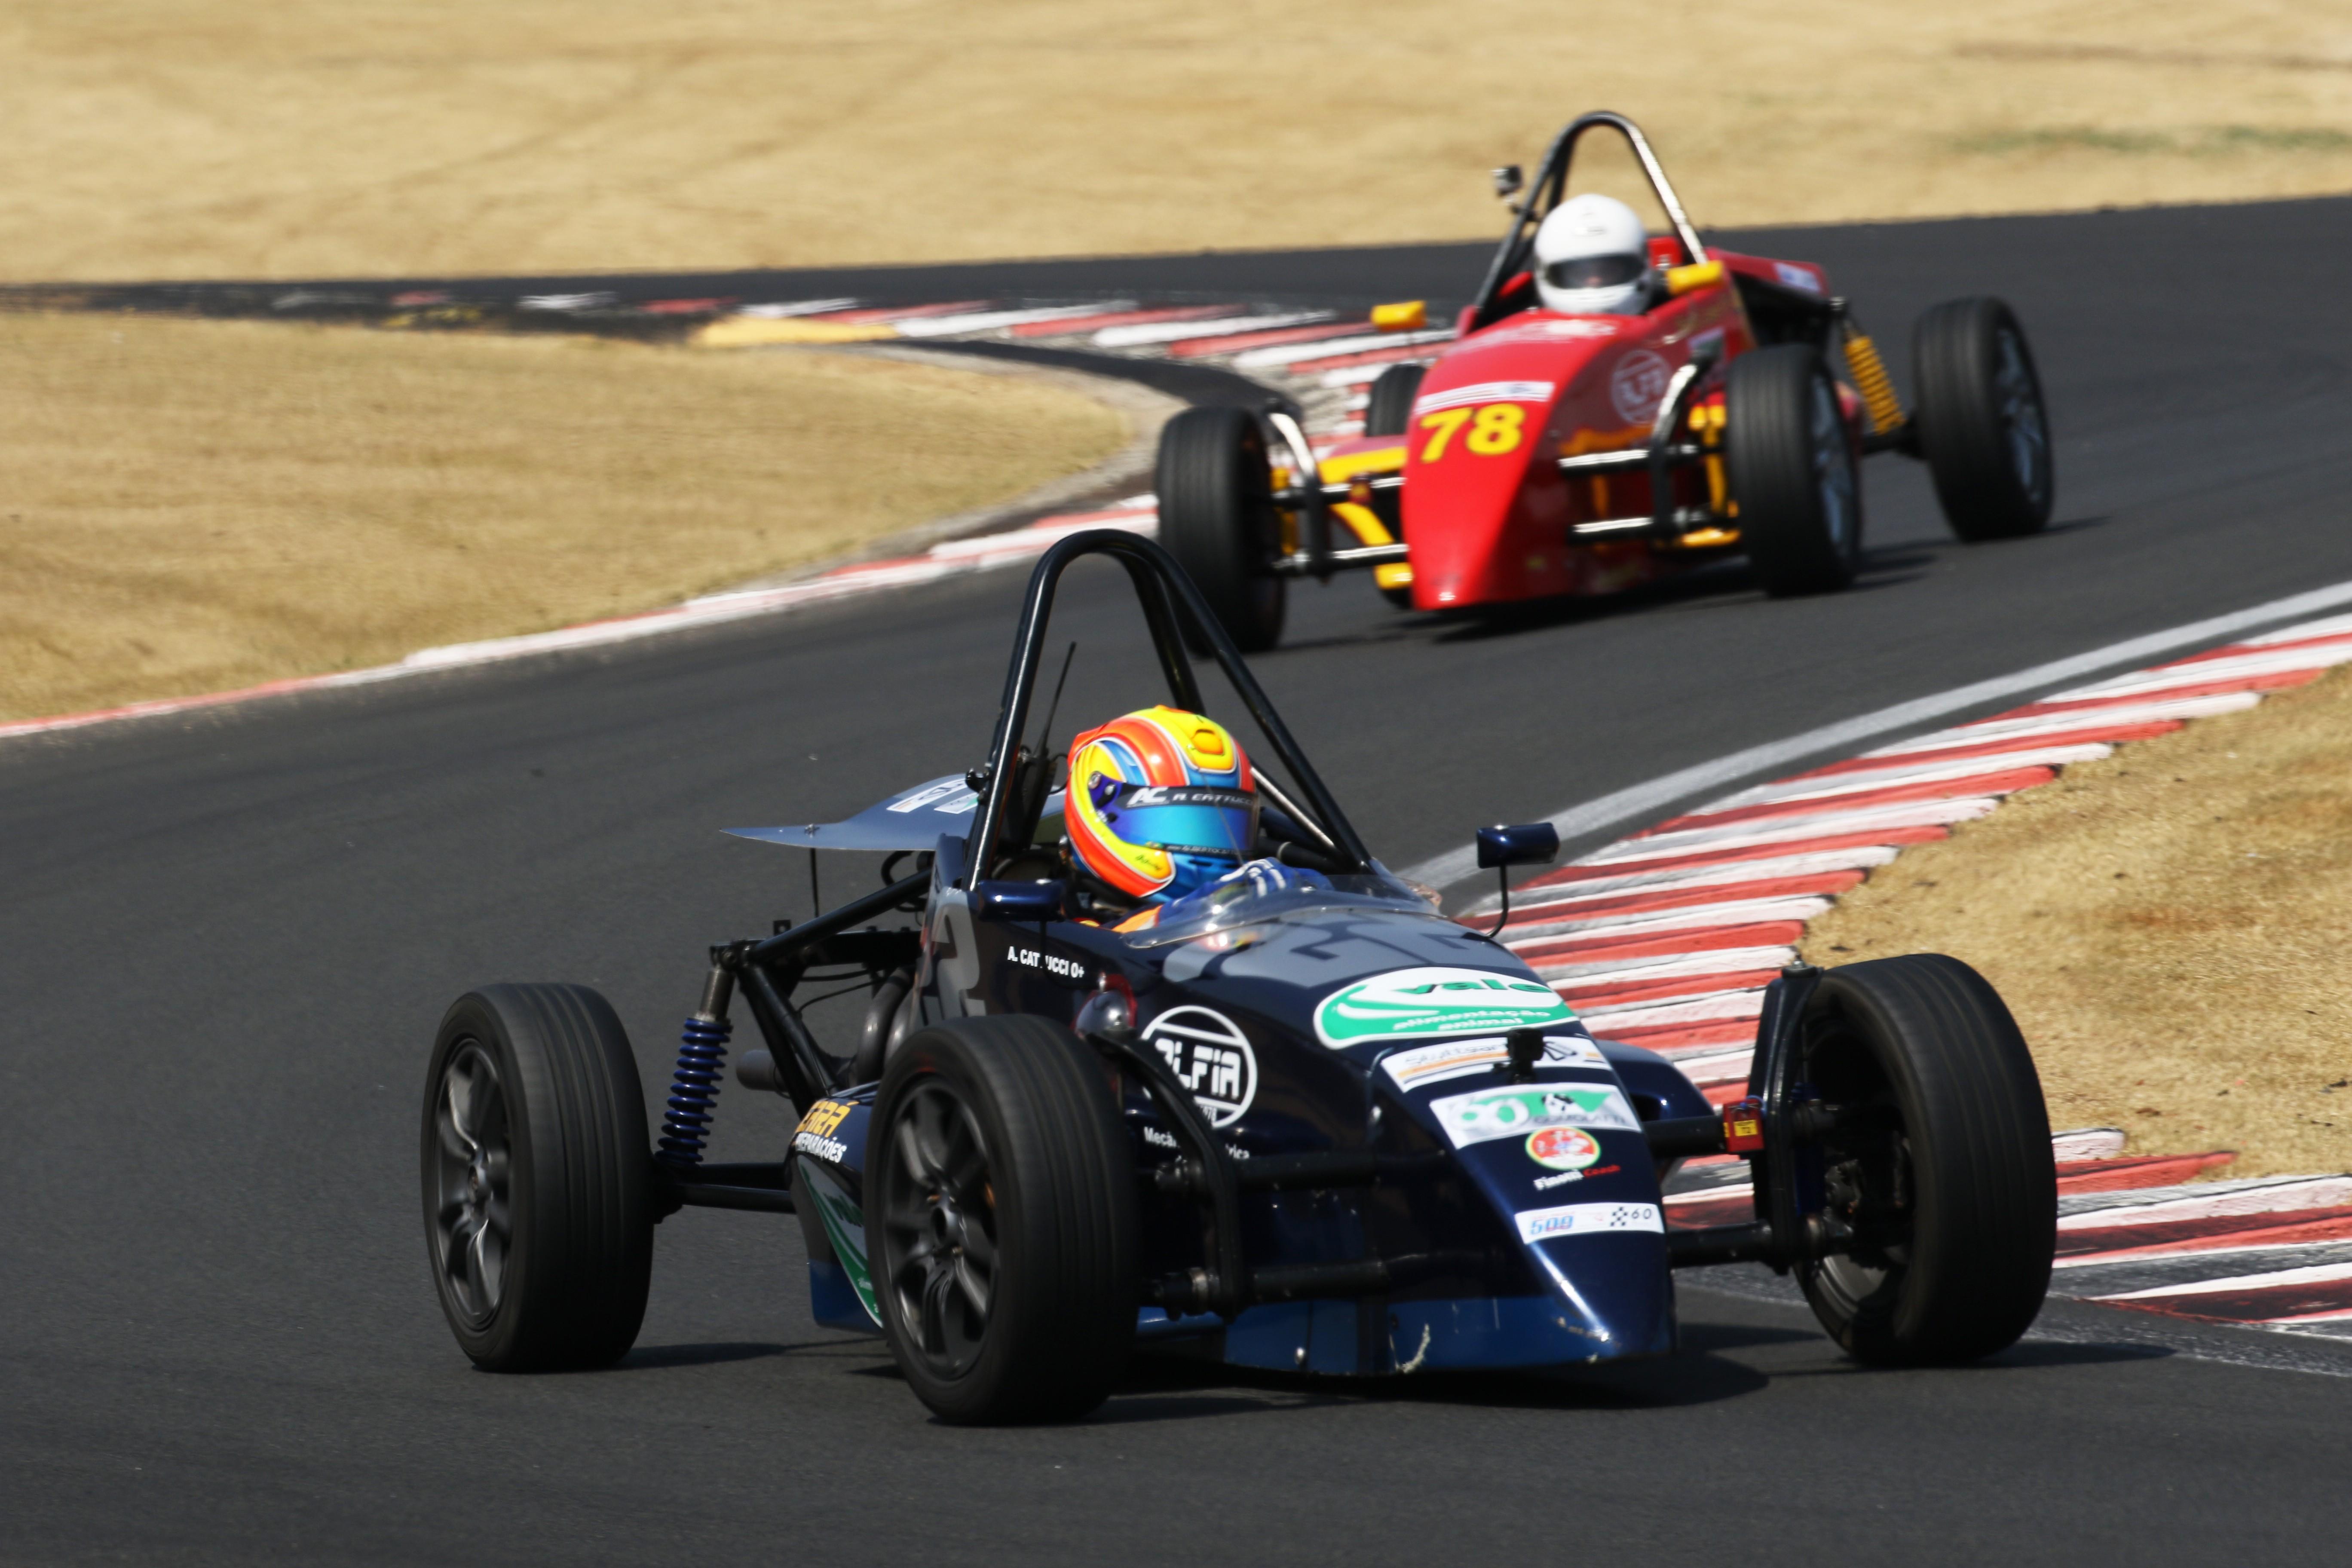 Alberto Cattucci saiu vitorioso da primeira corrida da F1600 (Foto: Claudio Kolodzie)